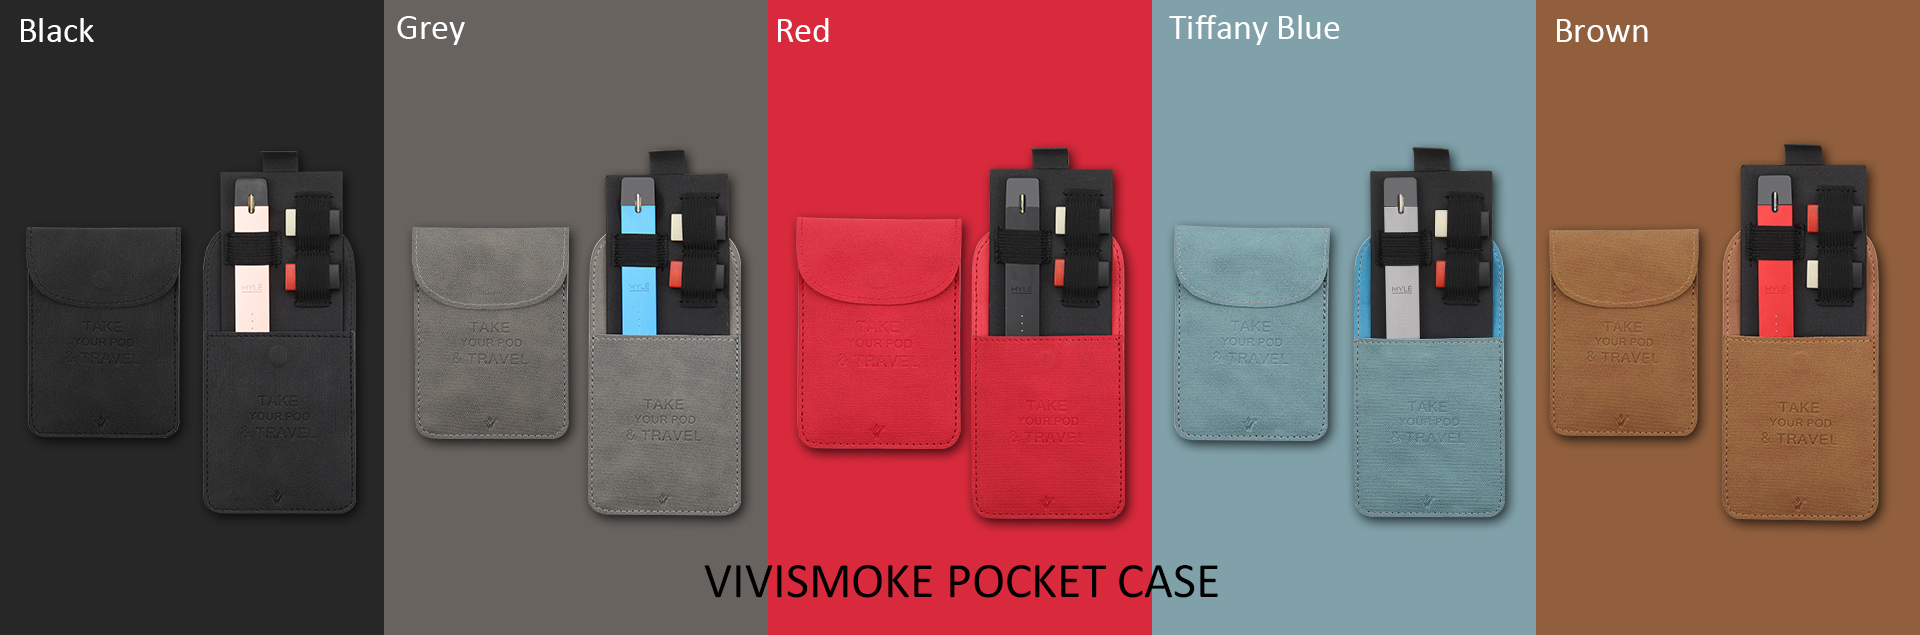 Vivismoke Pocket Case 5 Colors